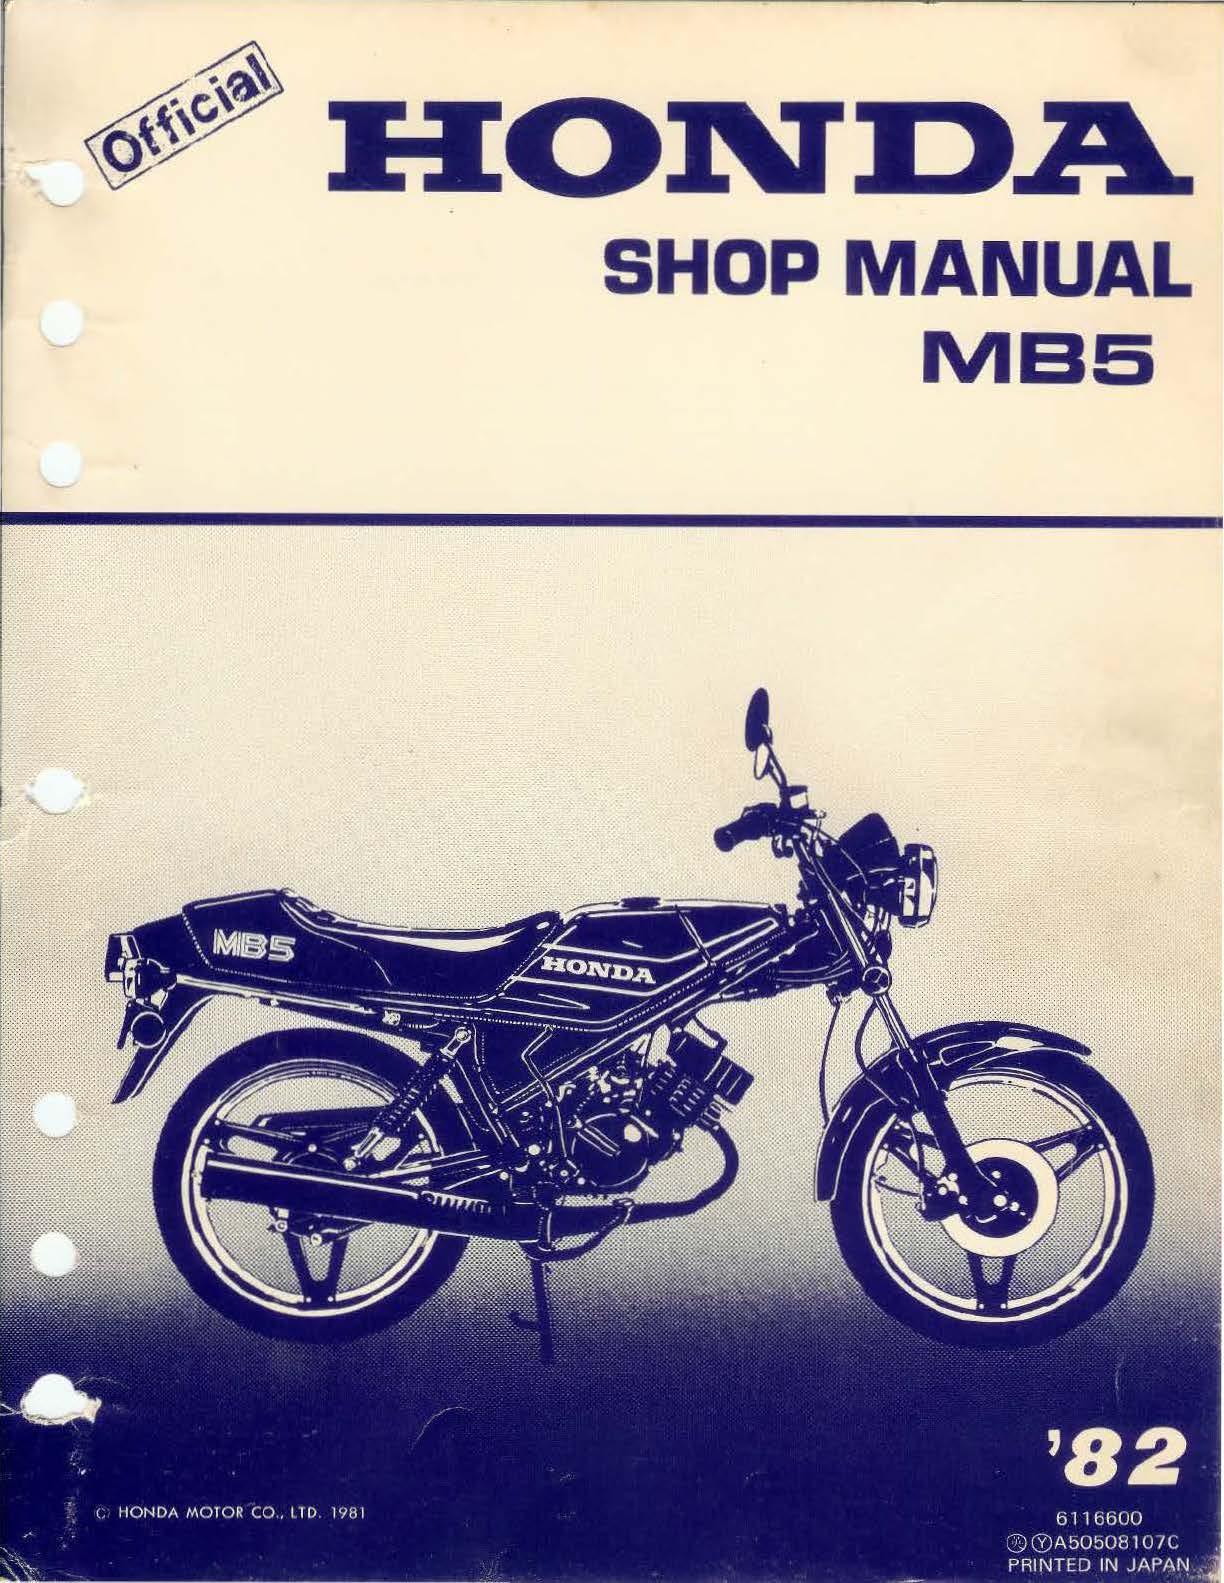 Workshop manual for Honda MB5 (1982)